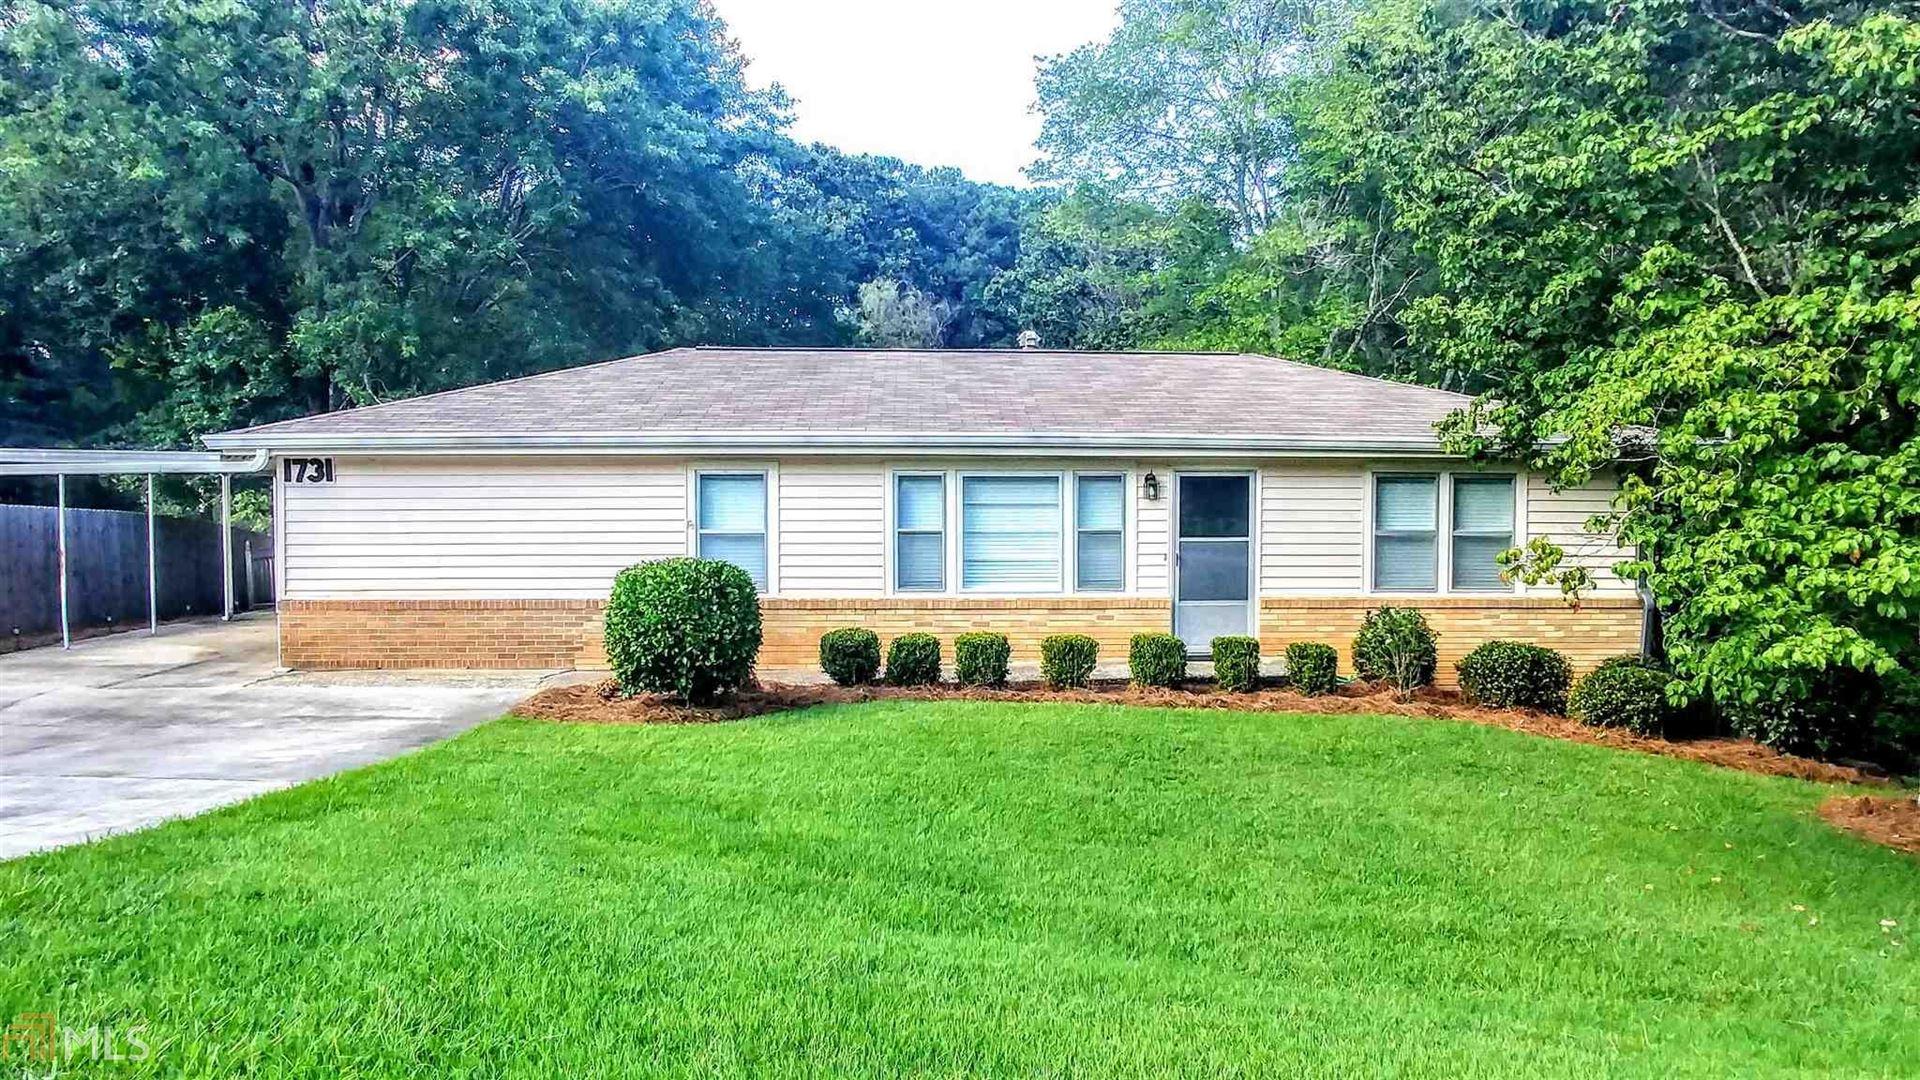 1731 Cunningham Rd, Marietta, GA 30008 - MLS#: 8851232